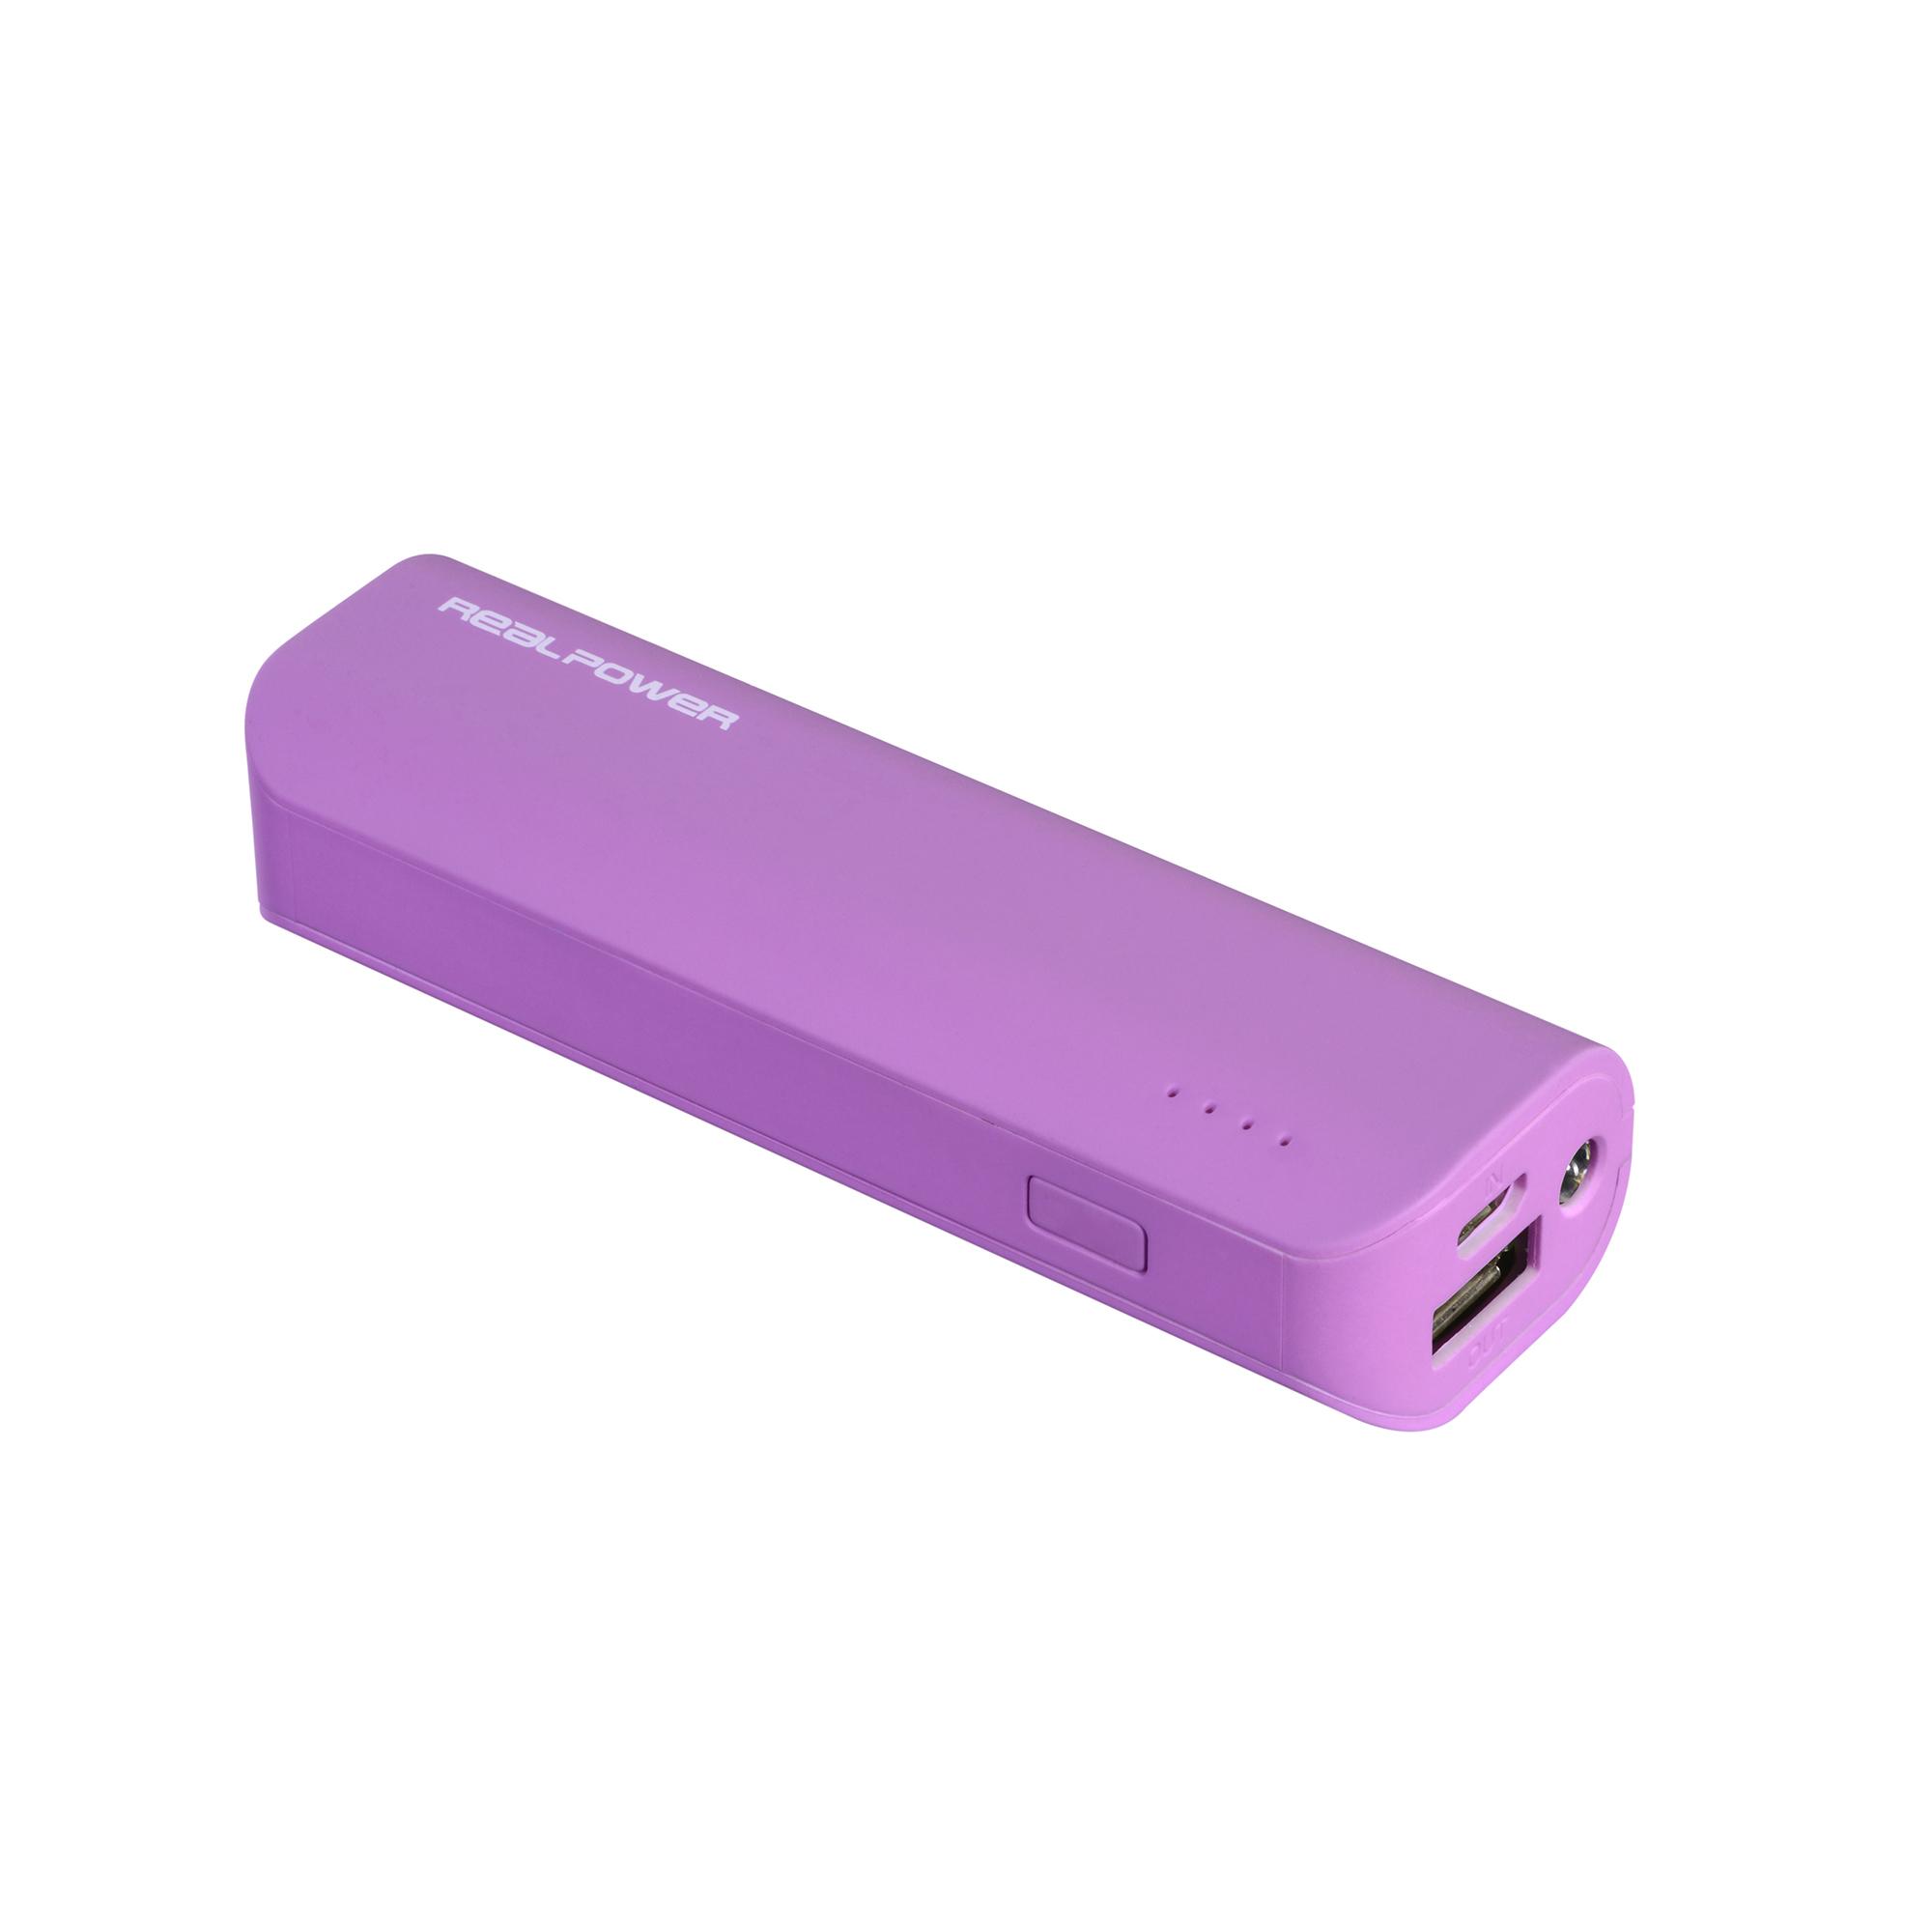 RealPower PB-2600 - Pink - Universal - Kautschuk - Rechteck - Lithium-Ion (Li-Ion) - 2600 mAh